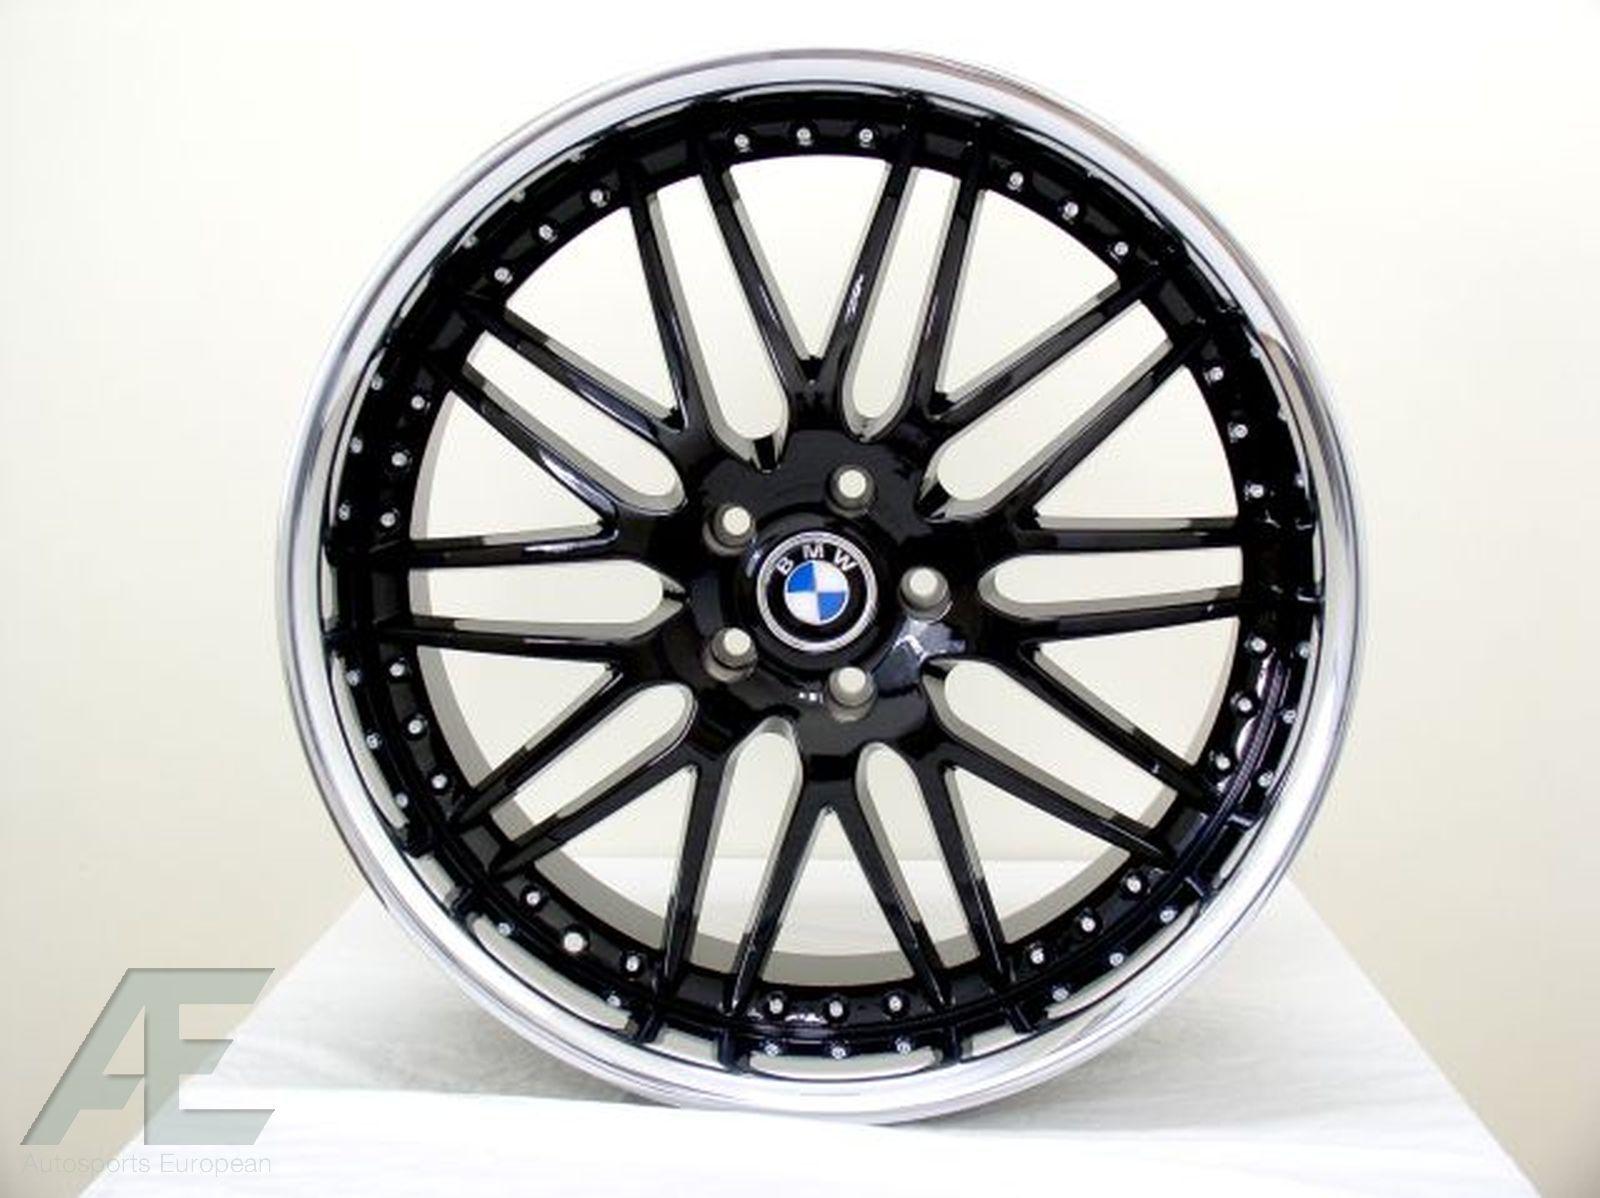 22 BMW Wheels Rim Tires x5 745i 750i 760i 650i 645i 20